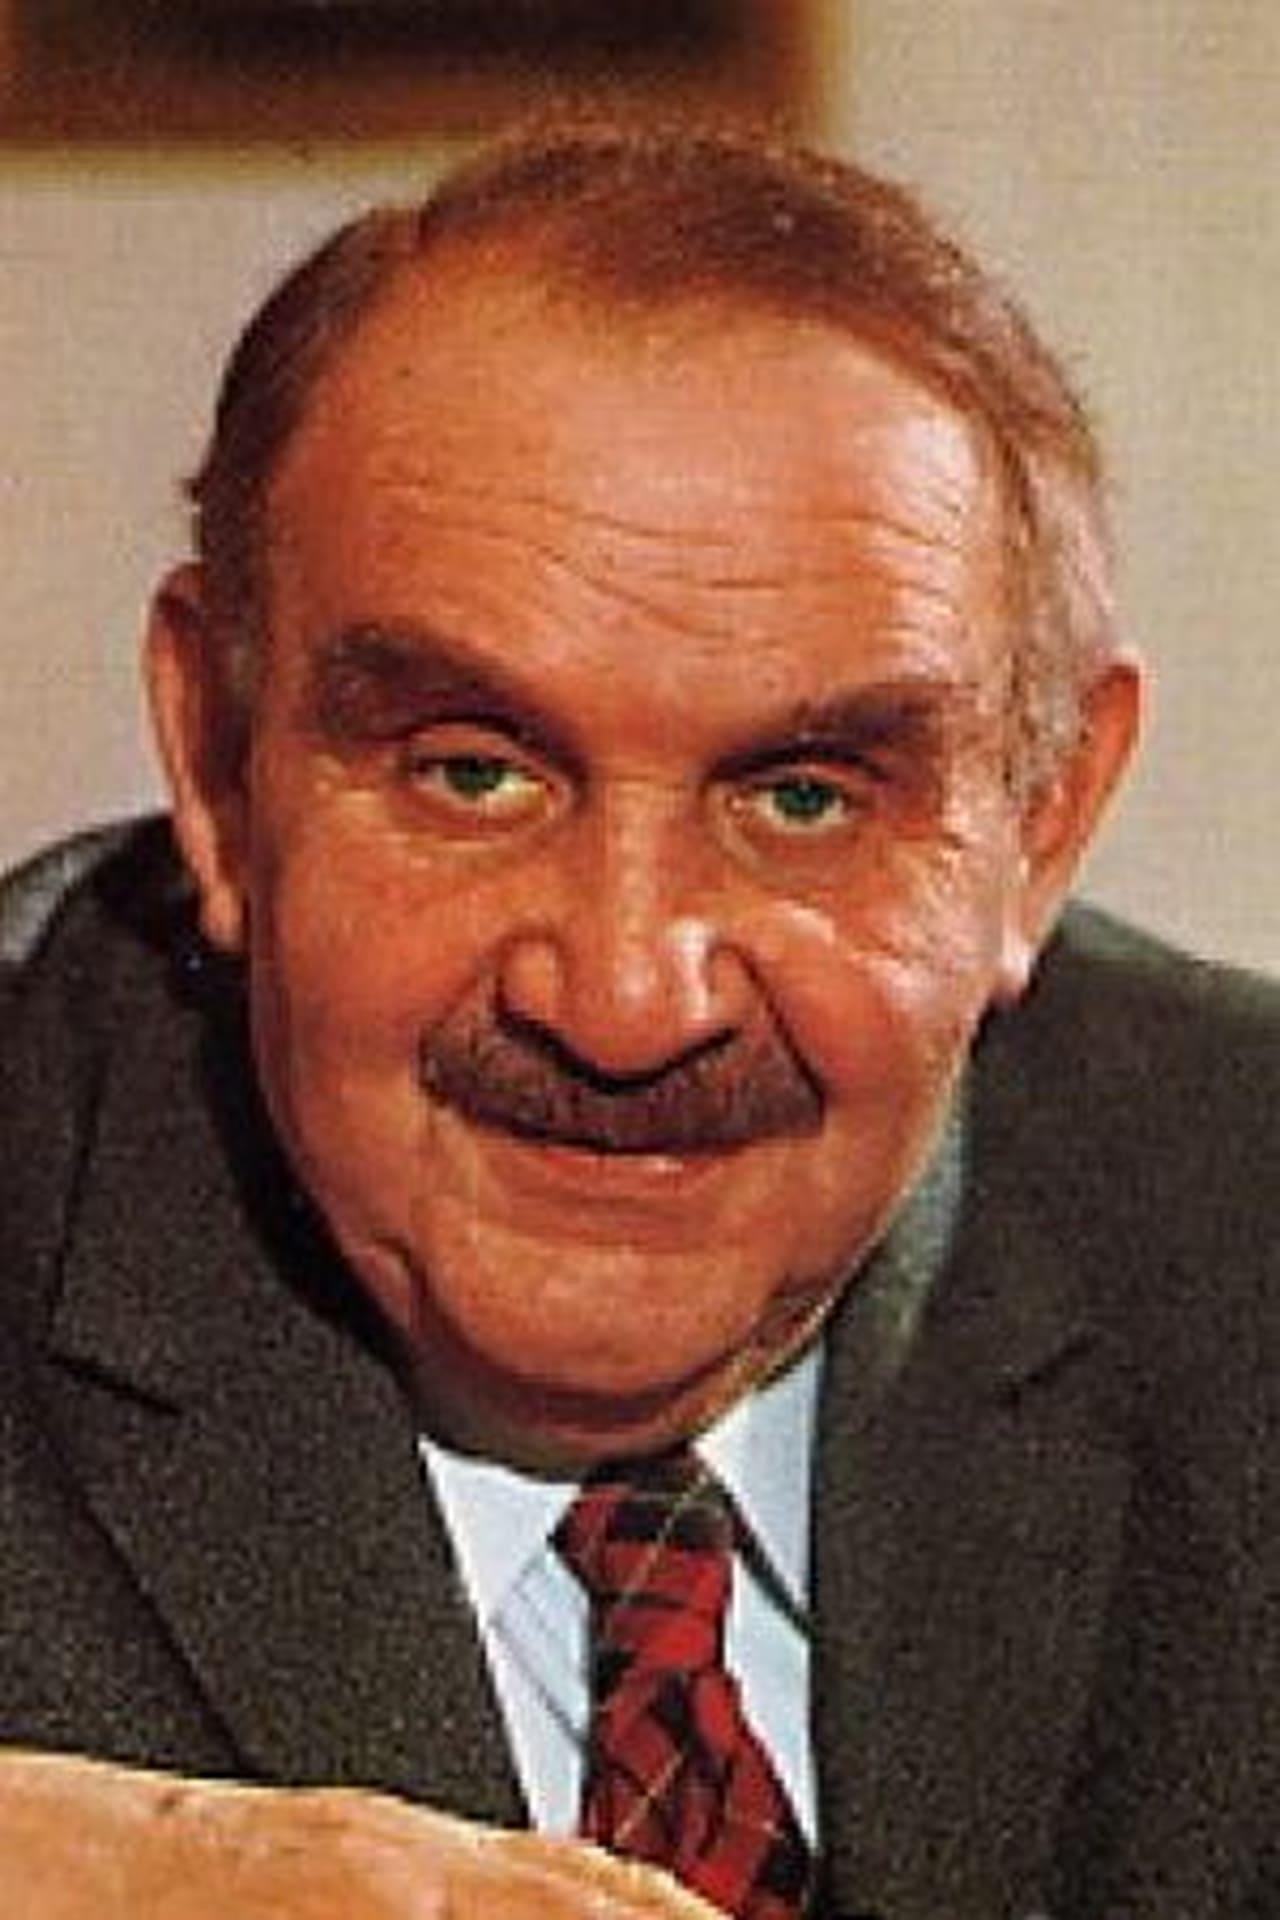 Fritz Eckhardt